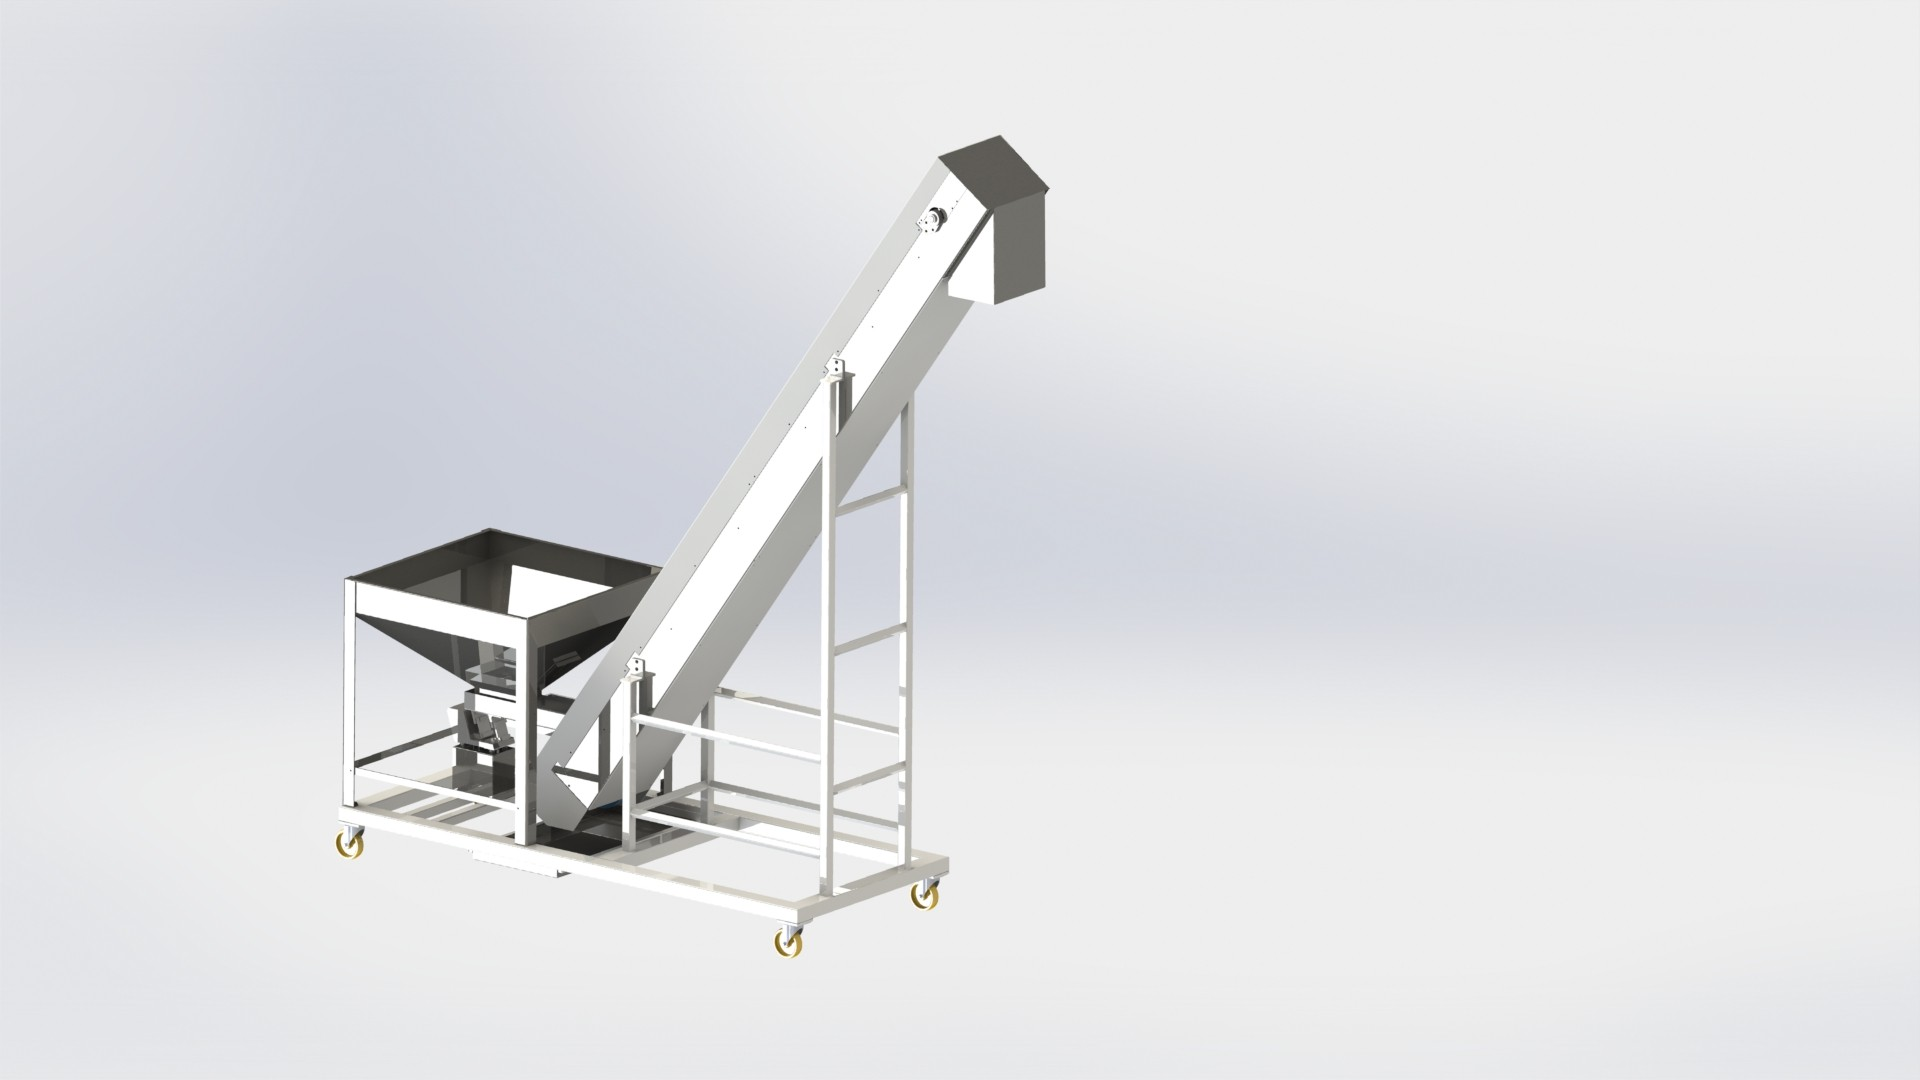 ELV-2700x320 - (1)